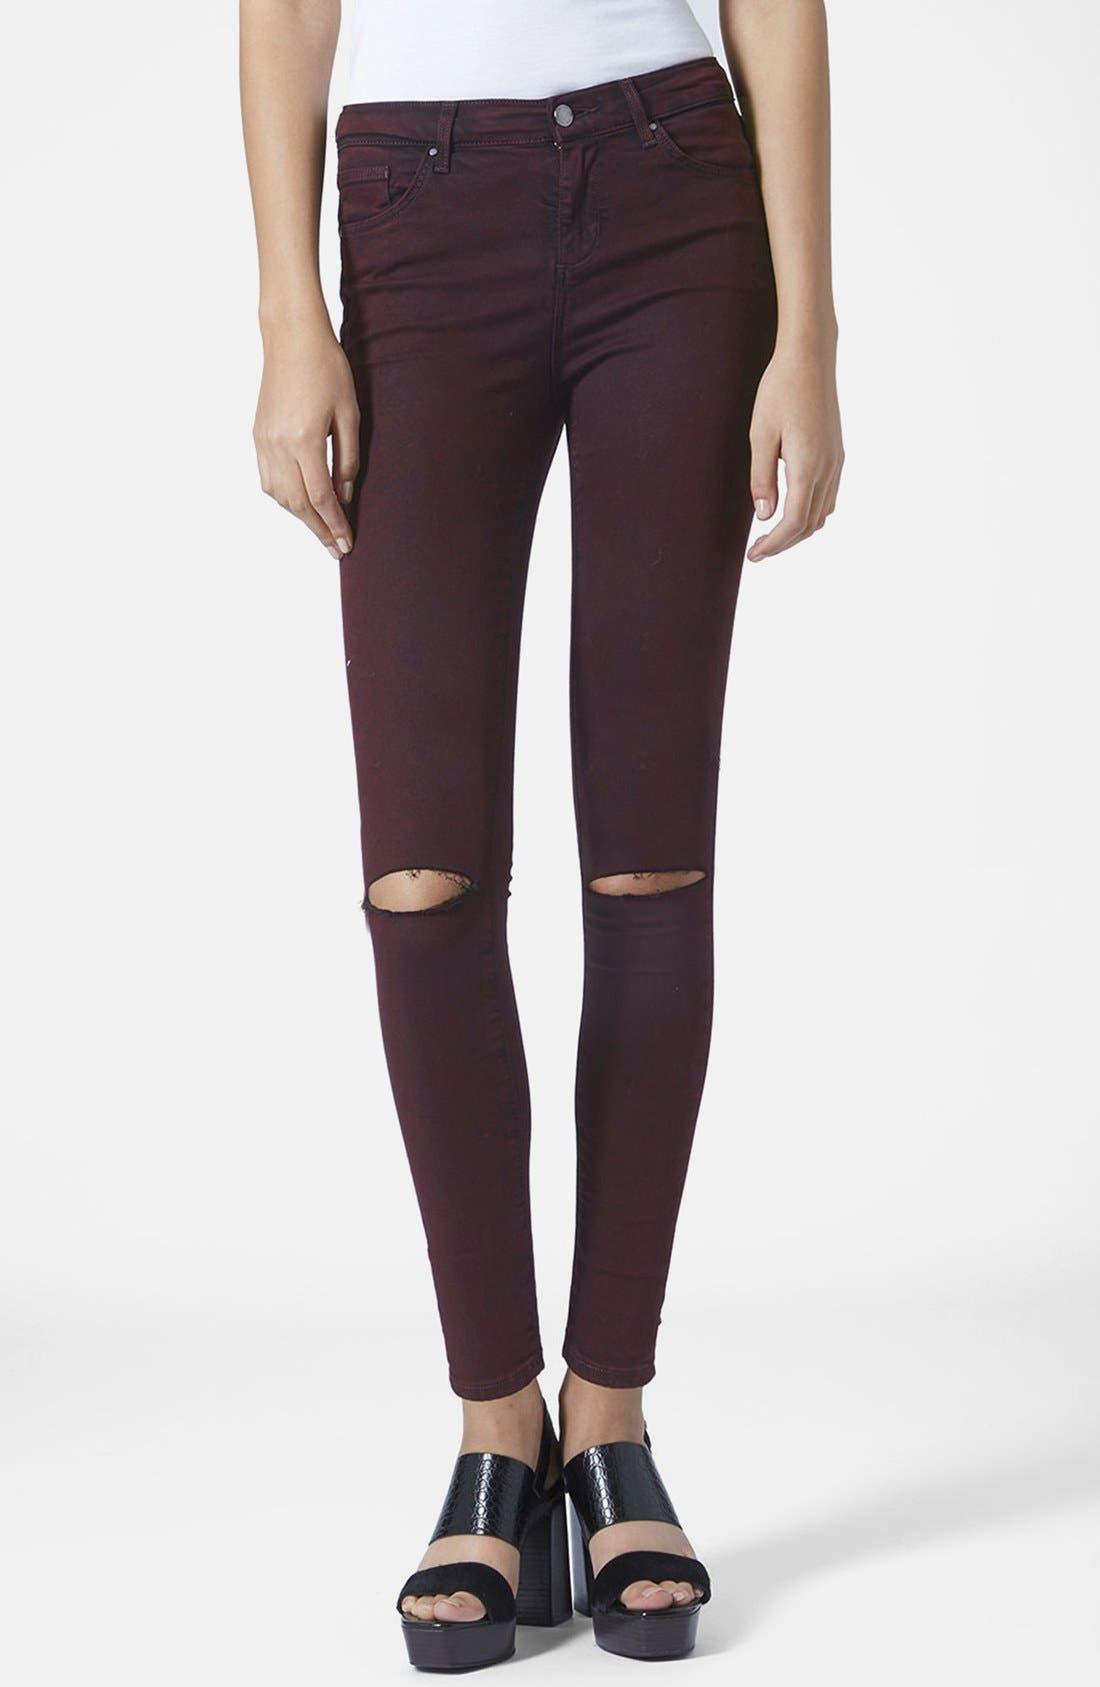 Alternate Image 1 Selected - Topshop Moto Destructed Ultra Skinny Jeans (Purple) (Regular, Short & Long)